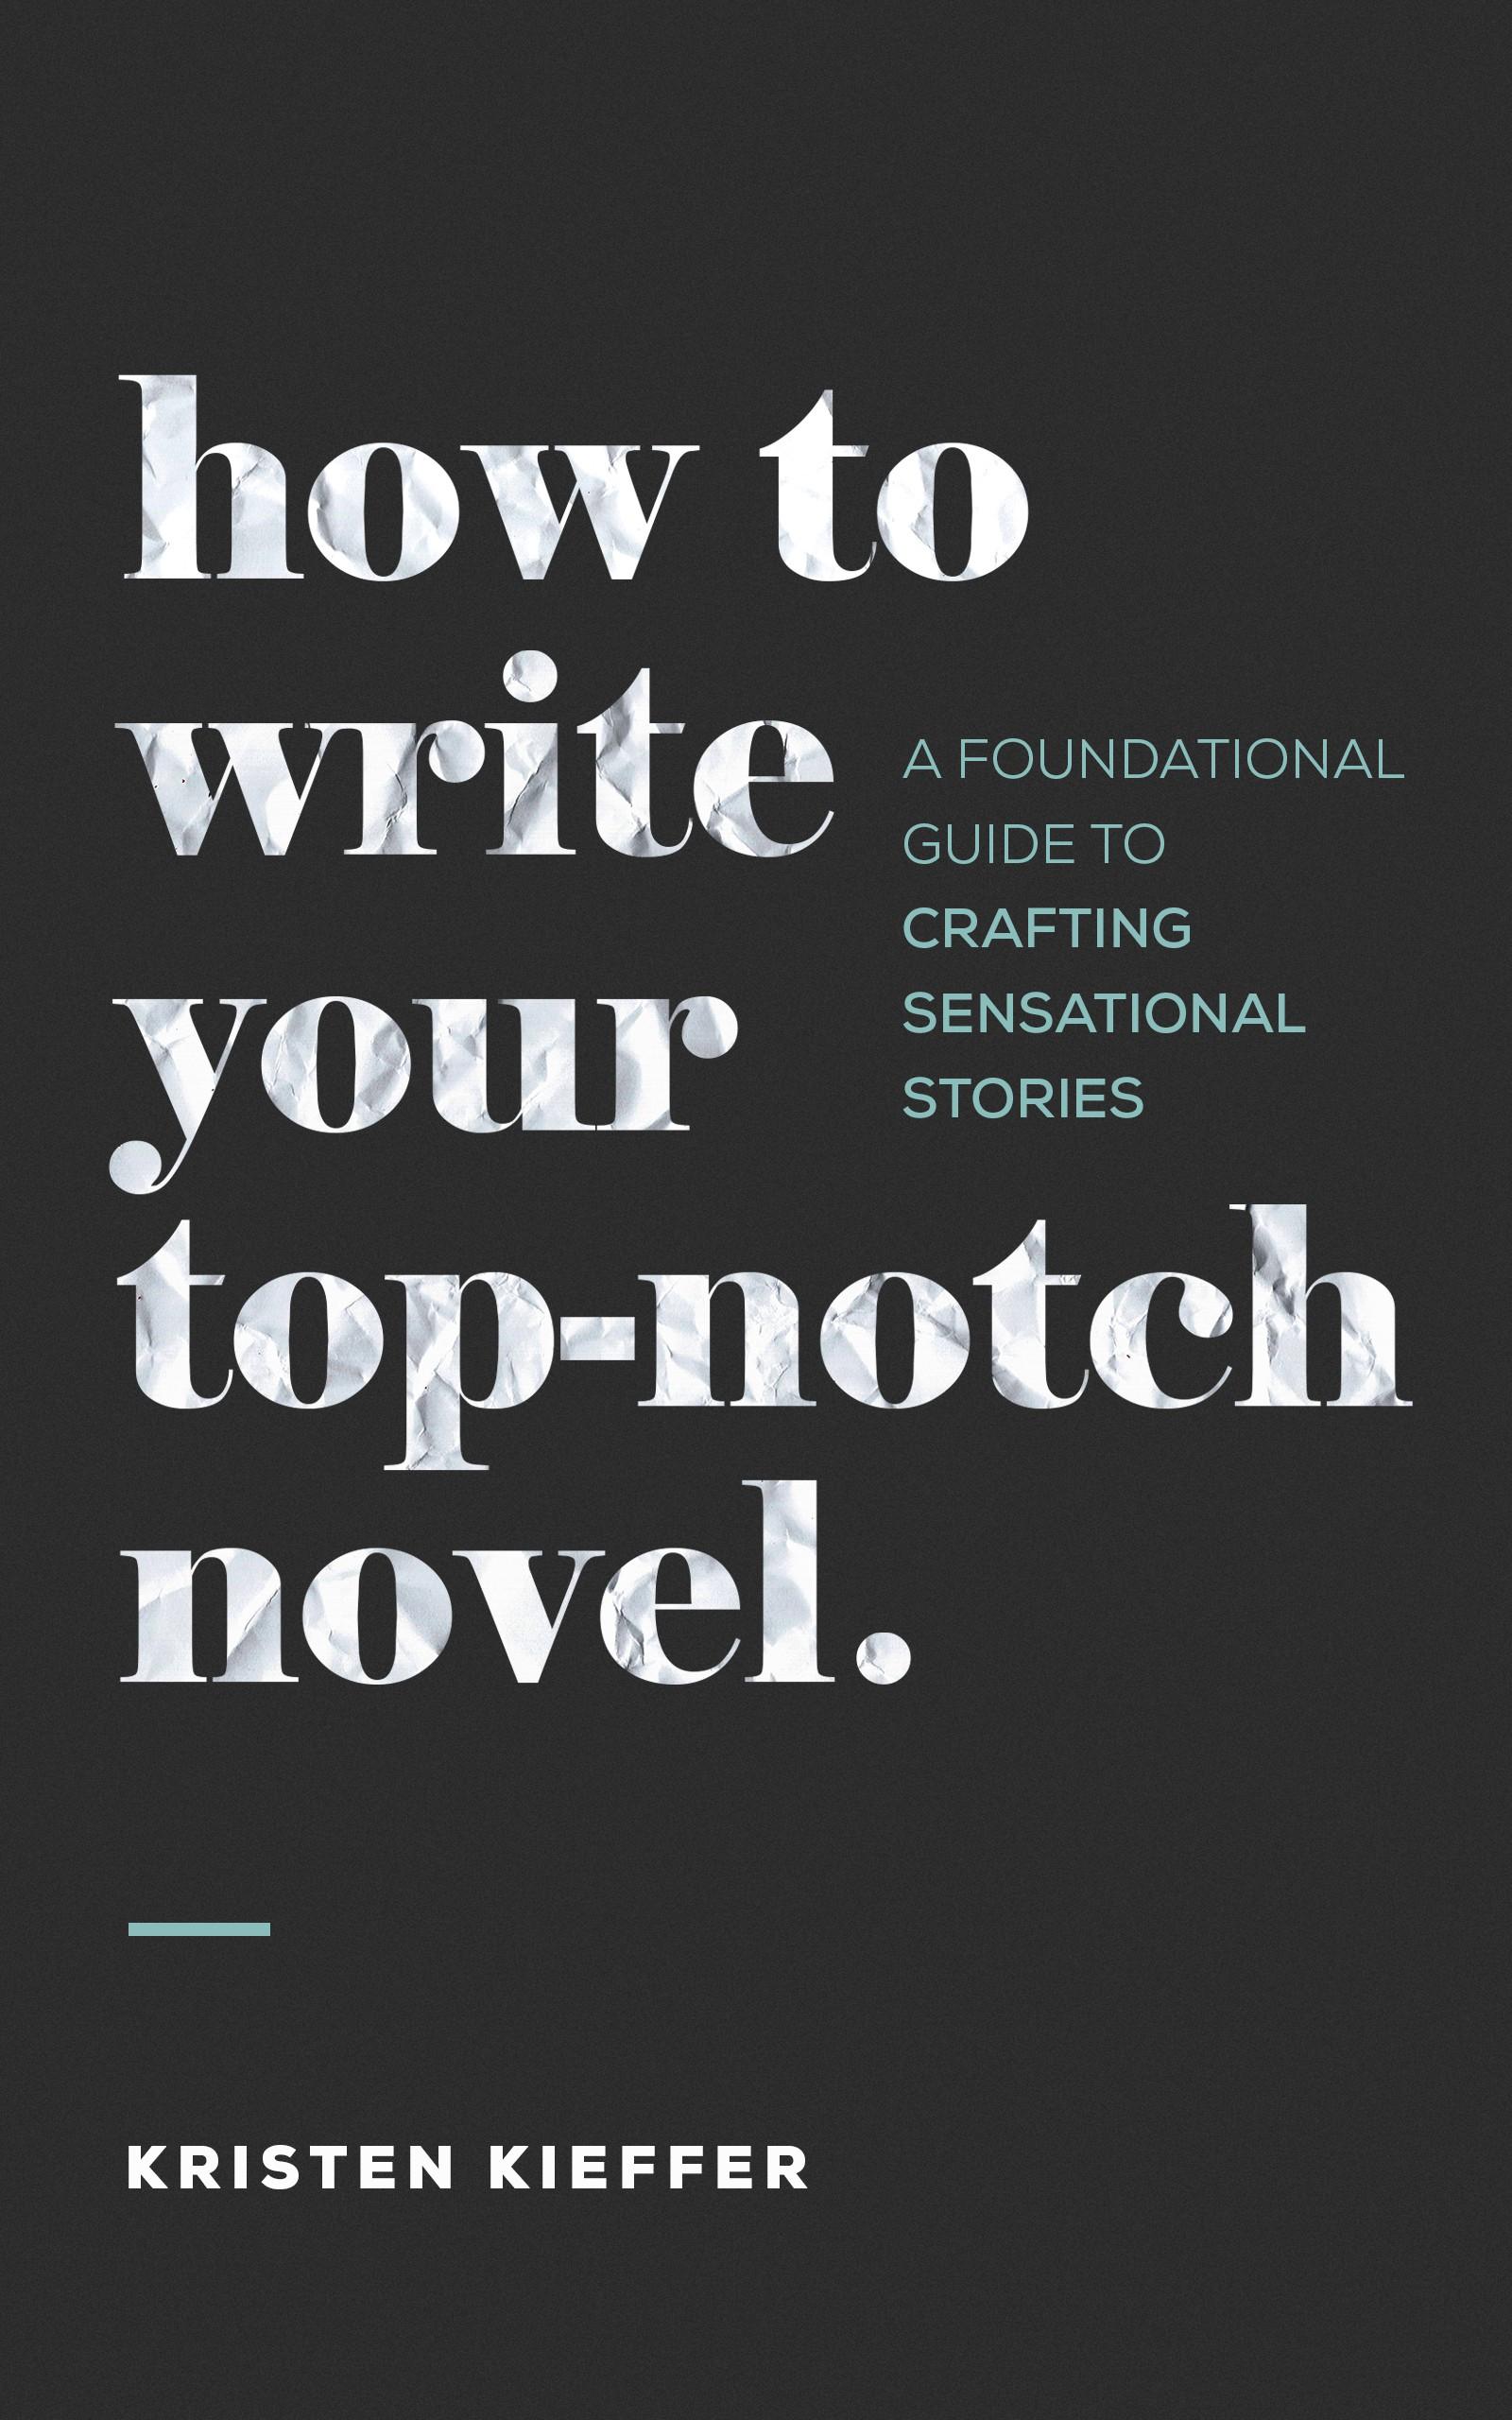 Write Your Top-Notch Novel (ebook cover design)